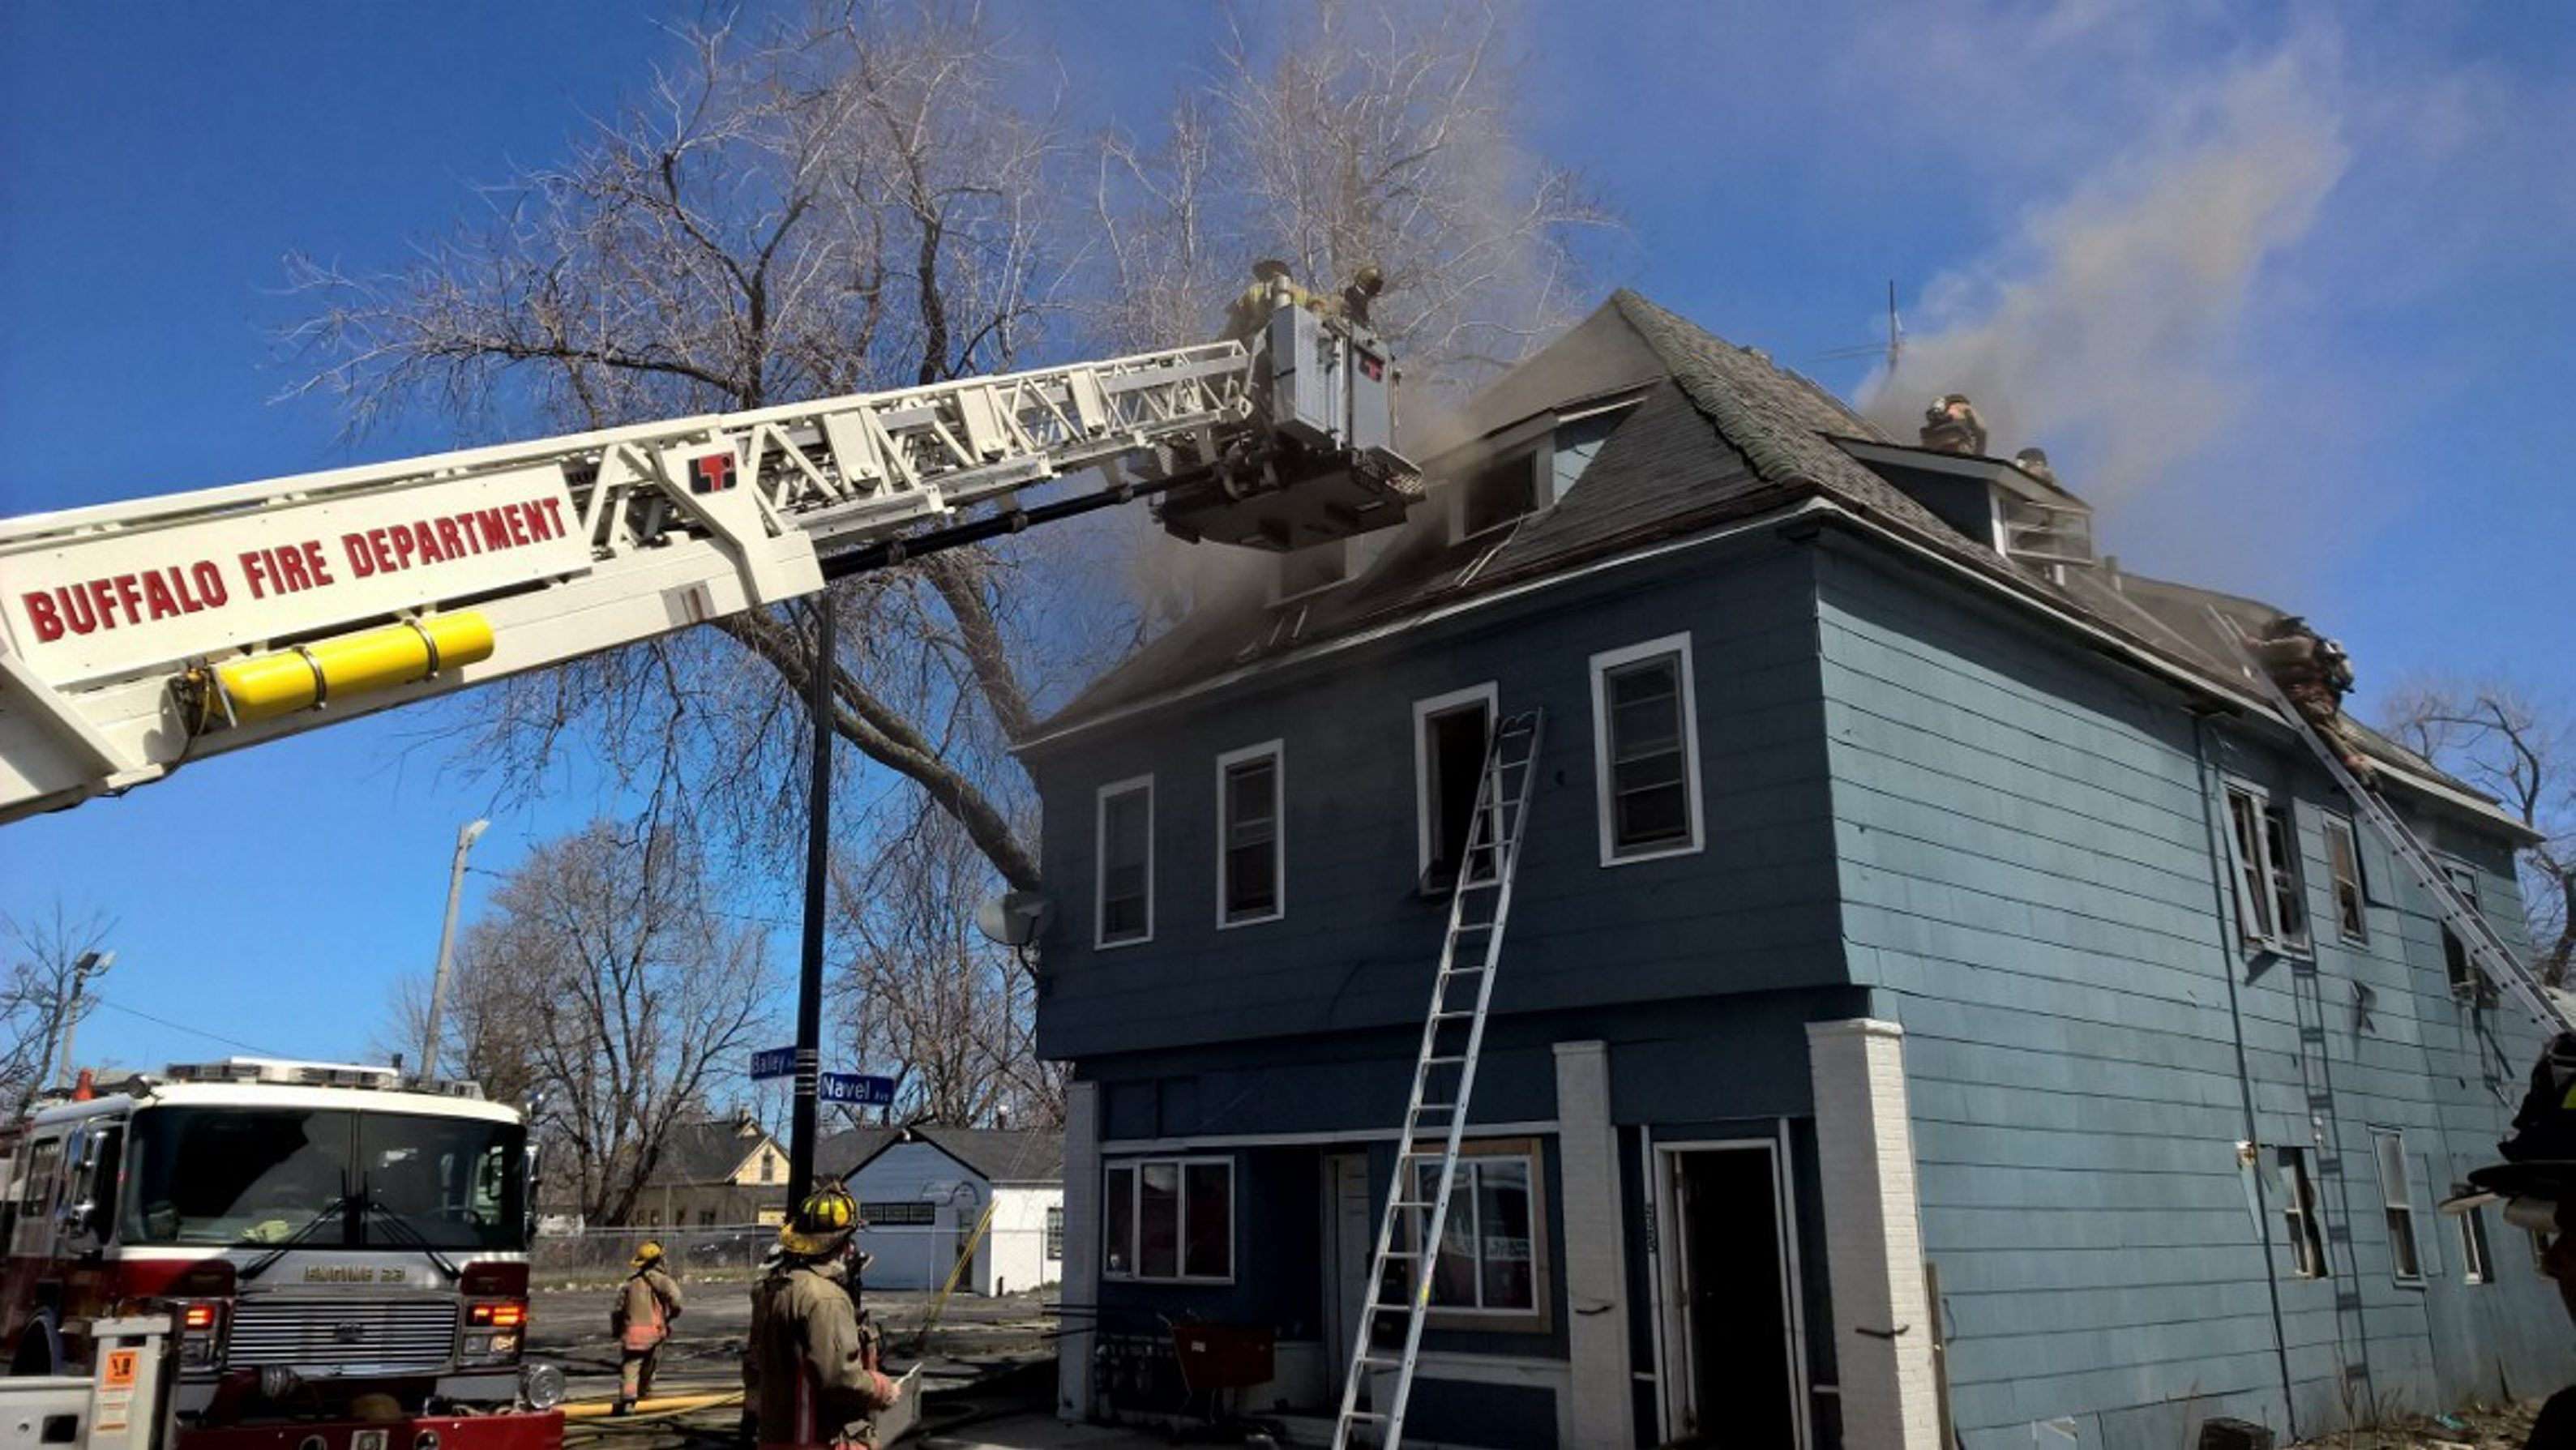 Buffalo firefighters at the scene of a house fire on Bailey Avenue Wednesday. (David Kazmierczak/Special to The Buffalo News)